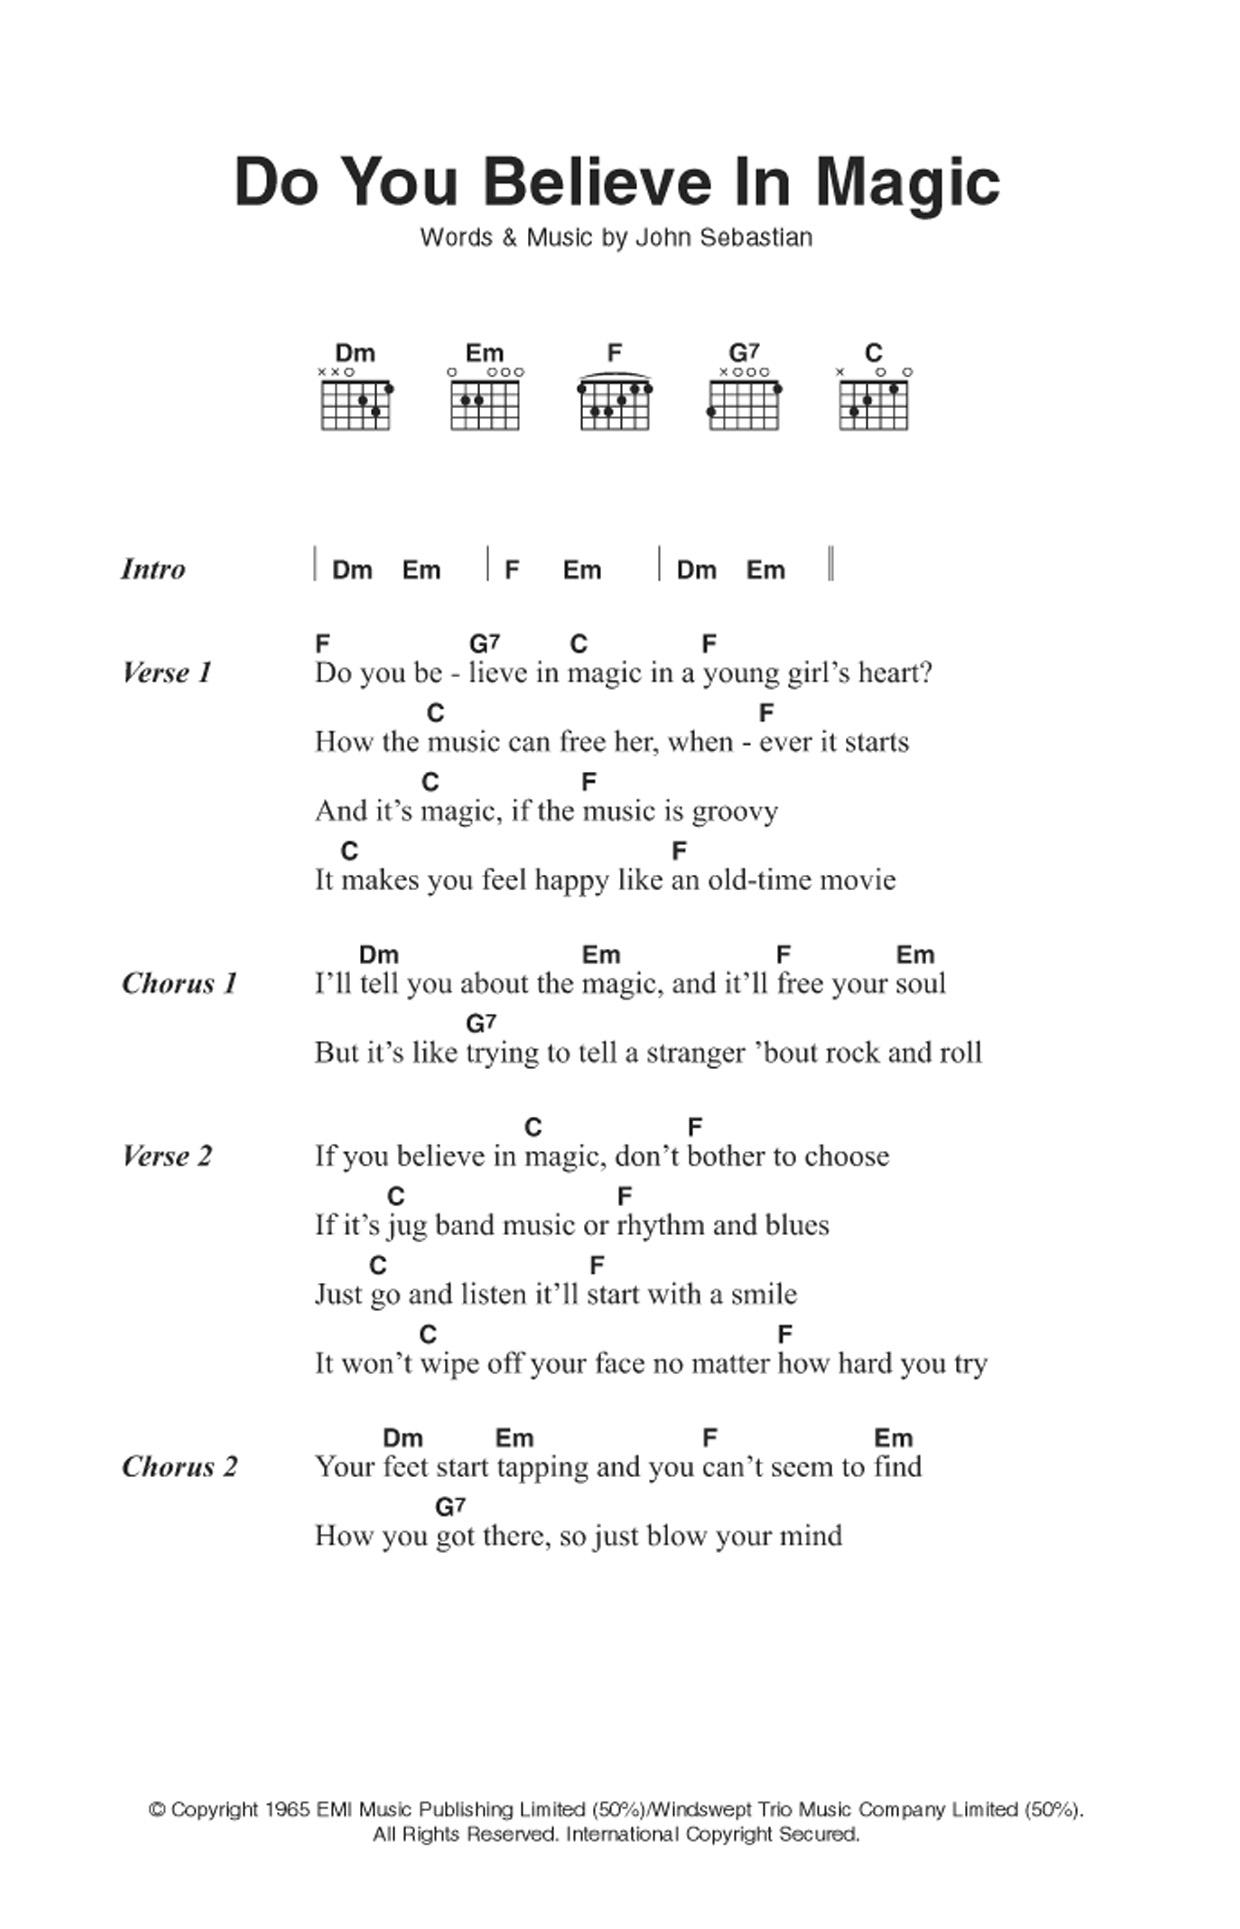 Do You Believe In Magic Sheet Music The Lovin Spoonful Lyrics